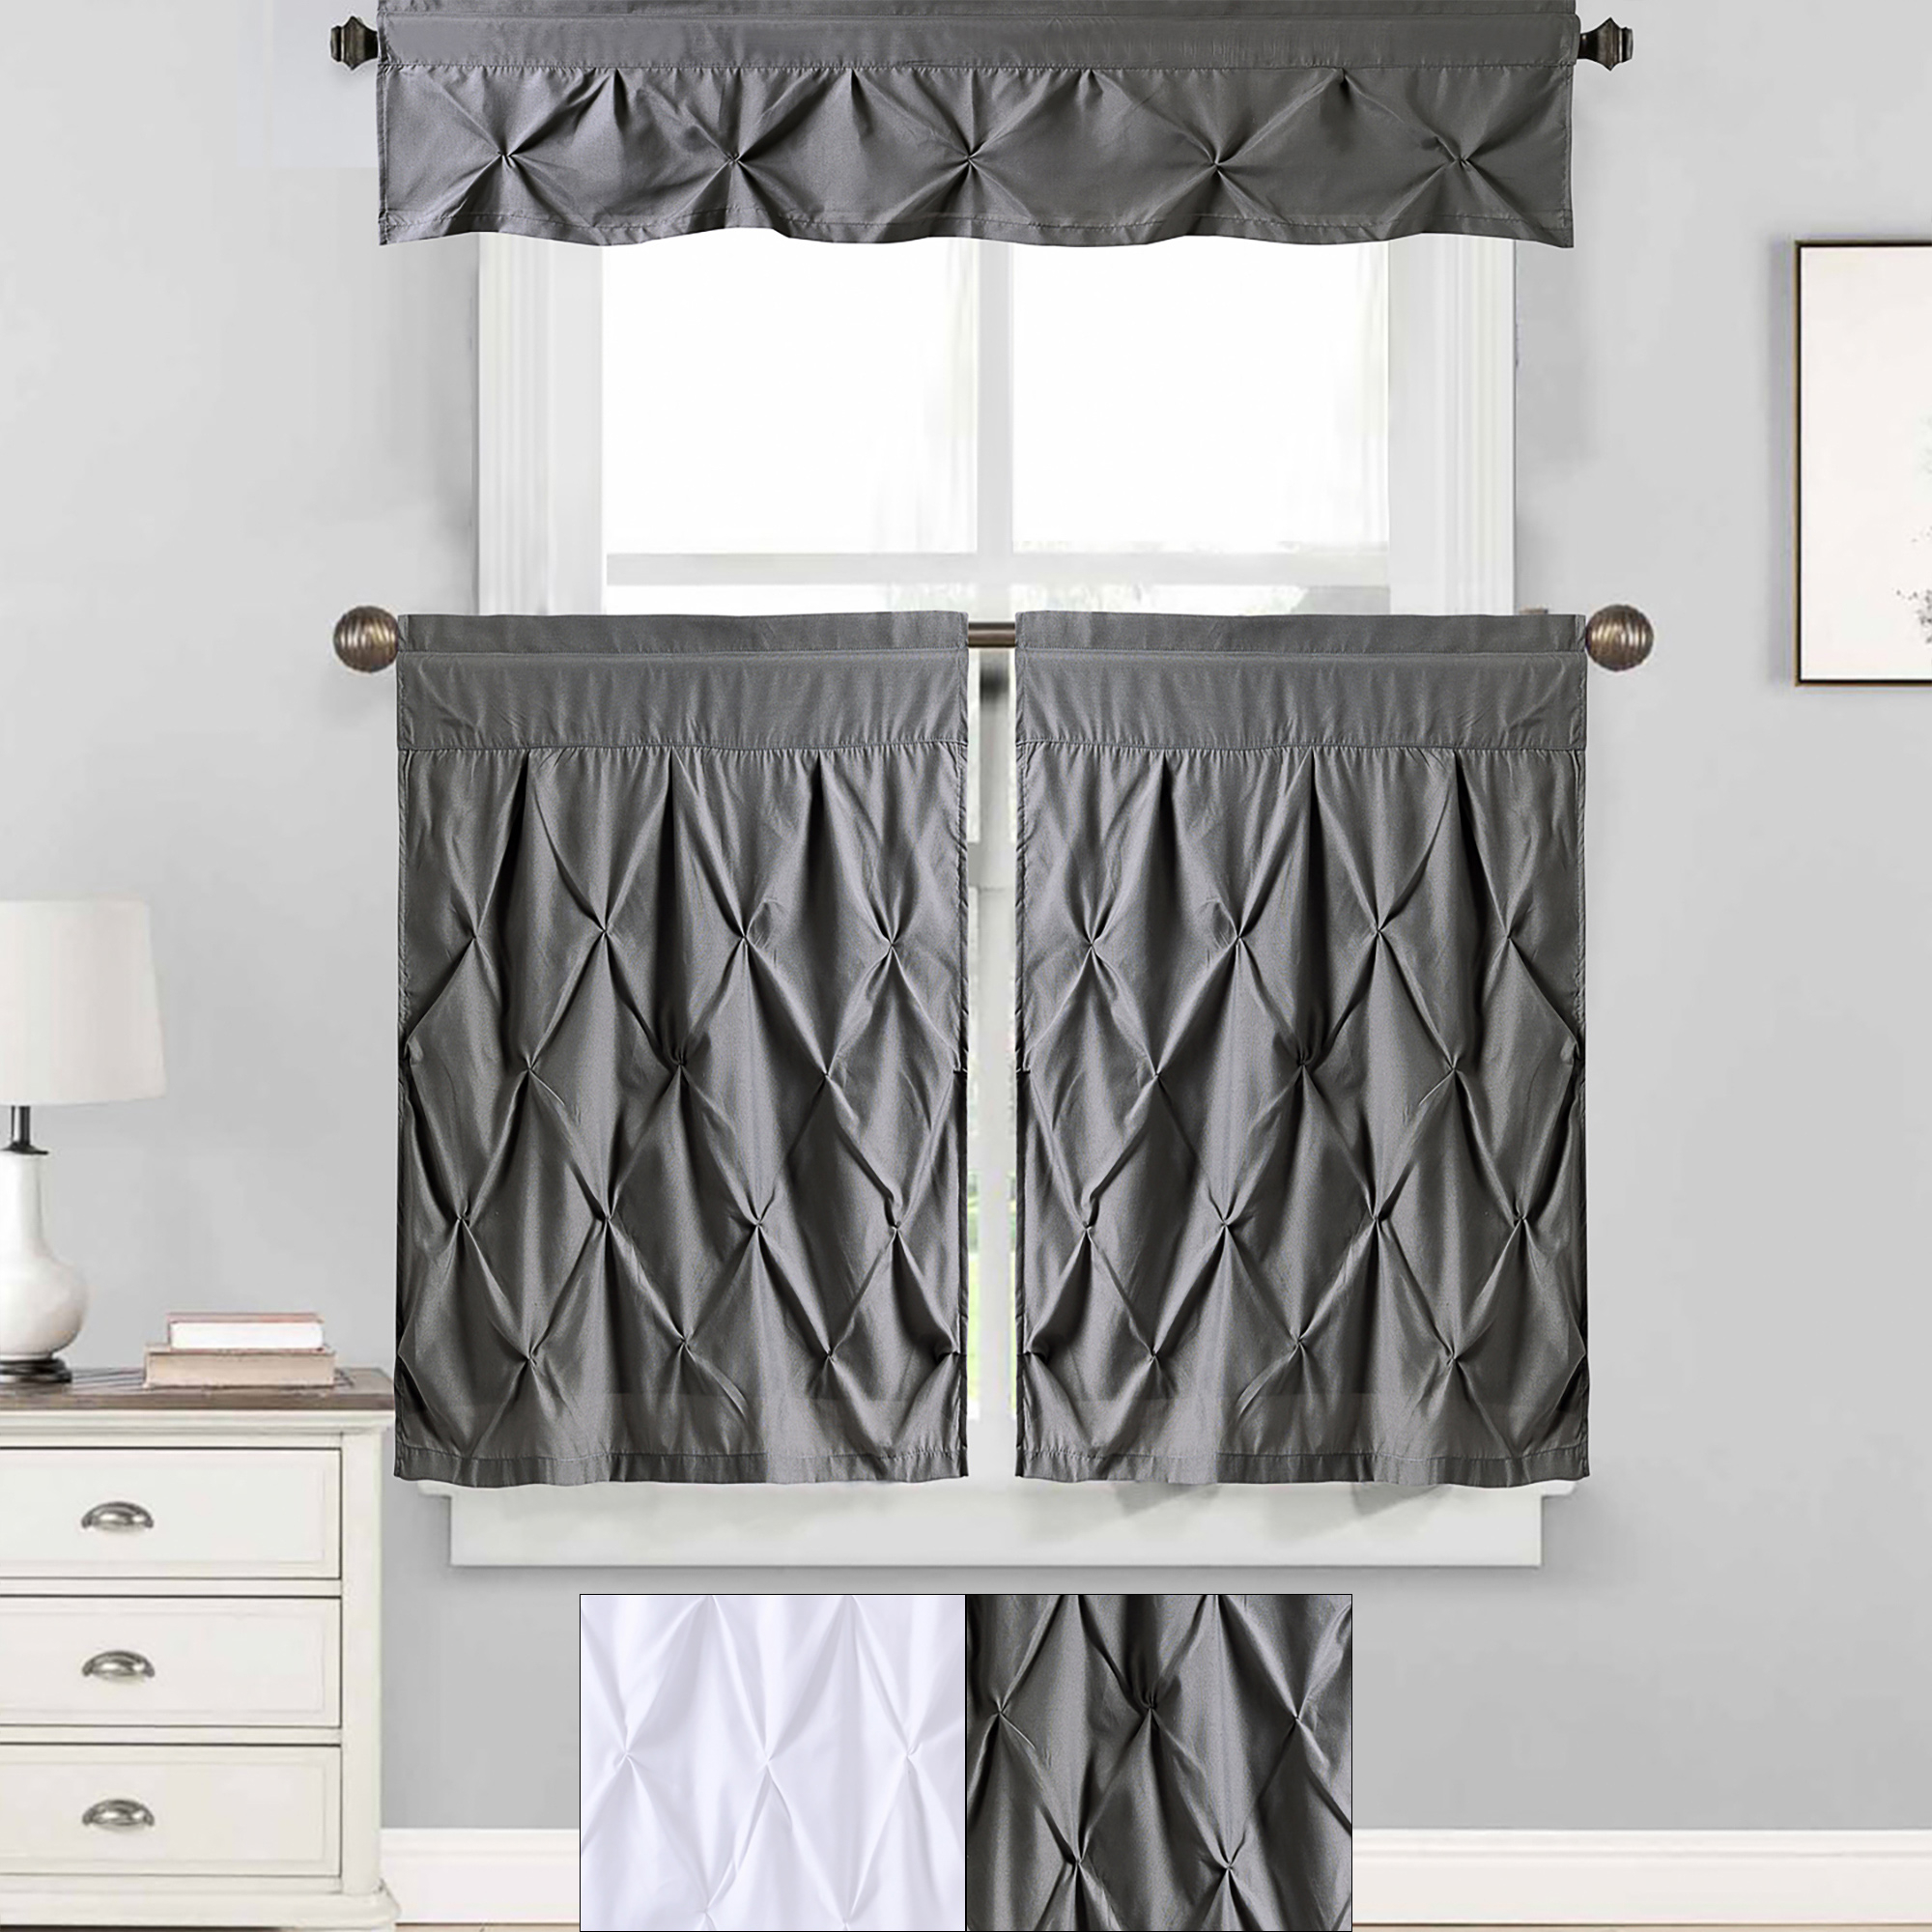 "Details Zu Hudson Pintuck Kitchen Window Curtain 36"" Tier Pair And Valance Set With Microfiber 3 Piece Kitchen Curtain Valance And Tiers Sets (View 13 of 20)"